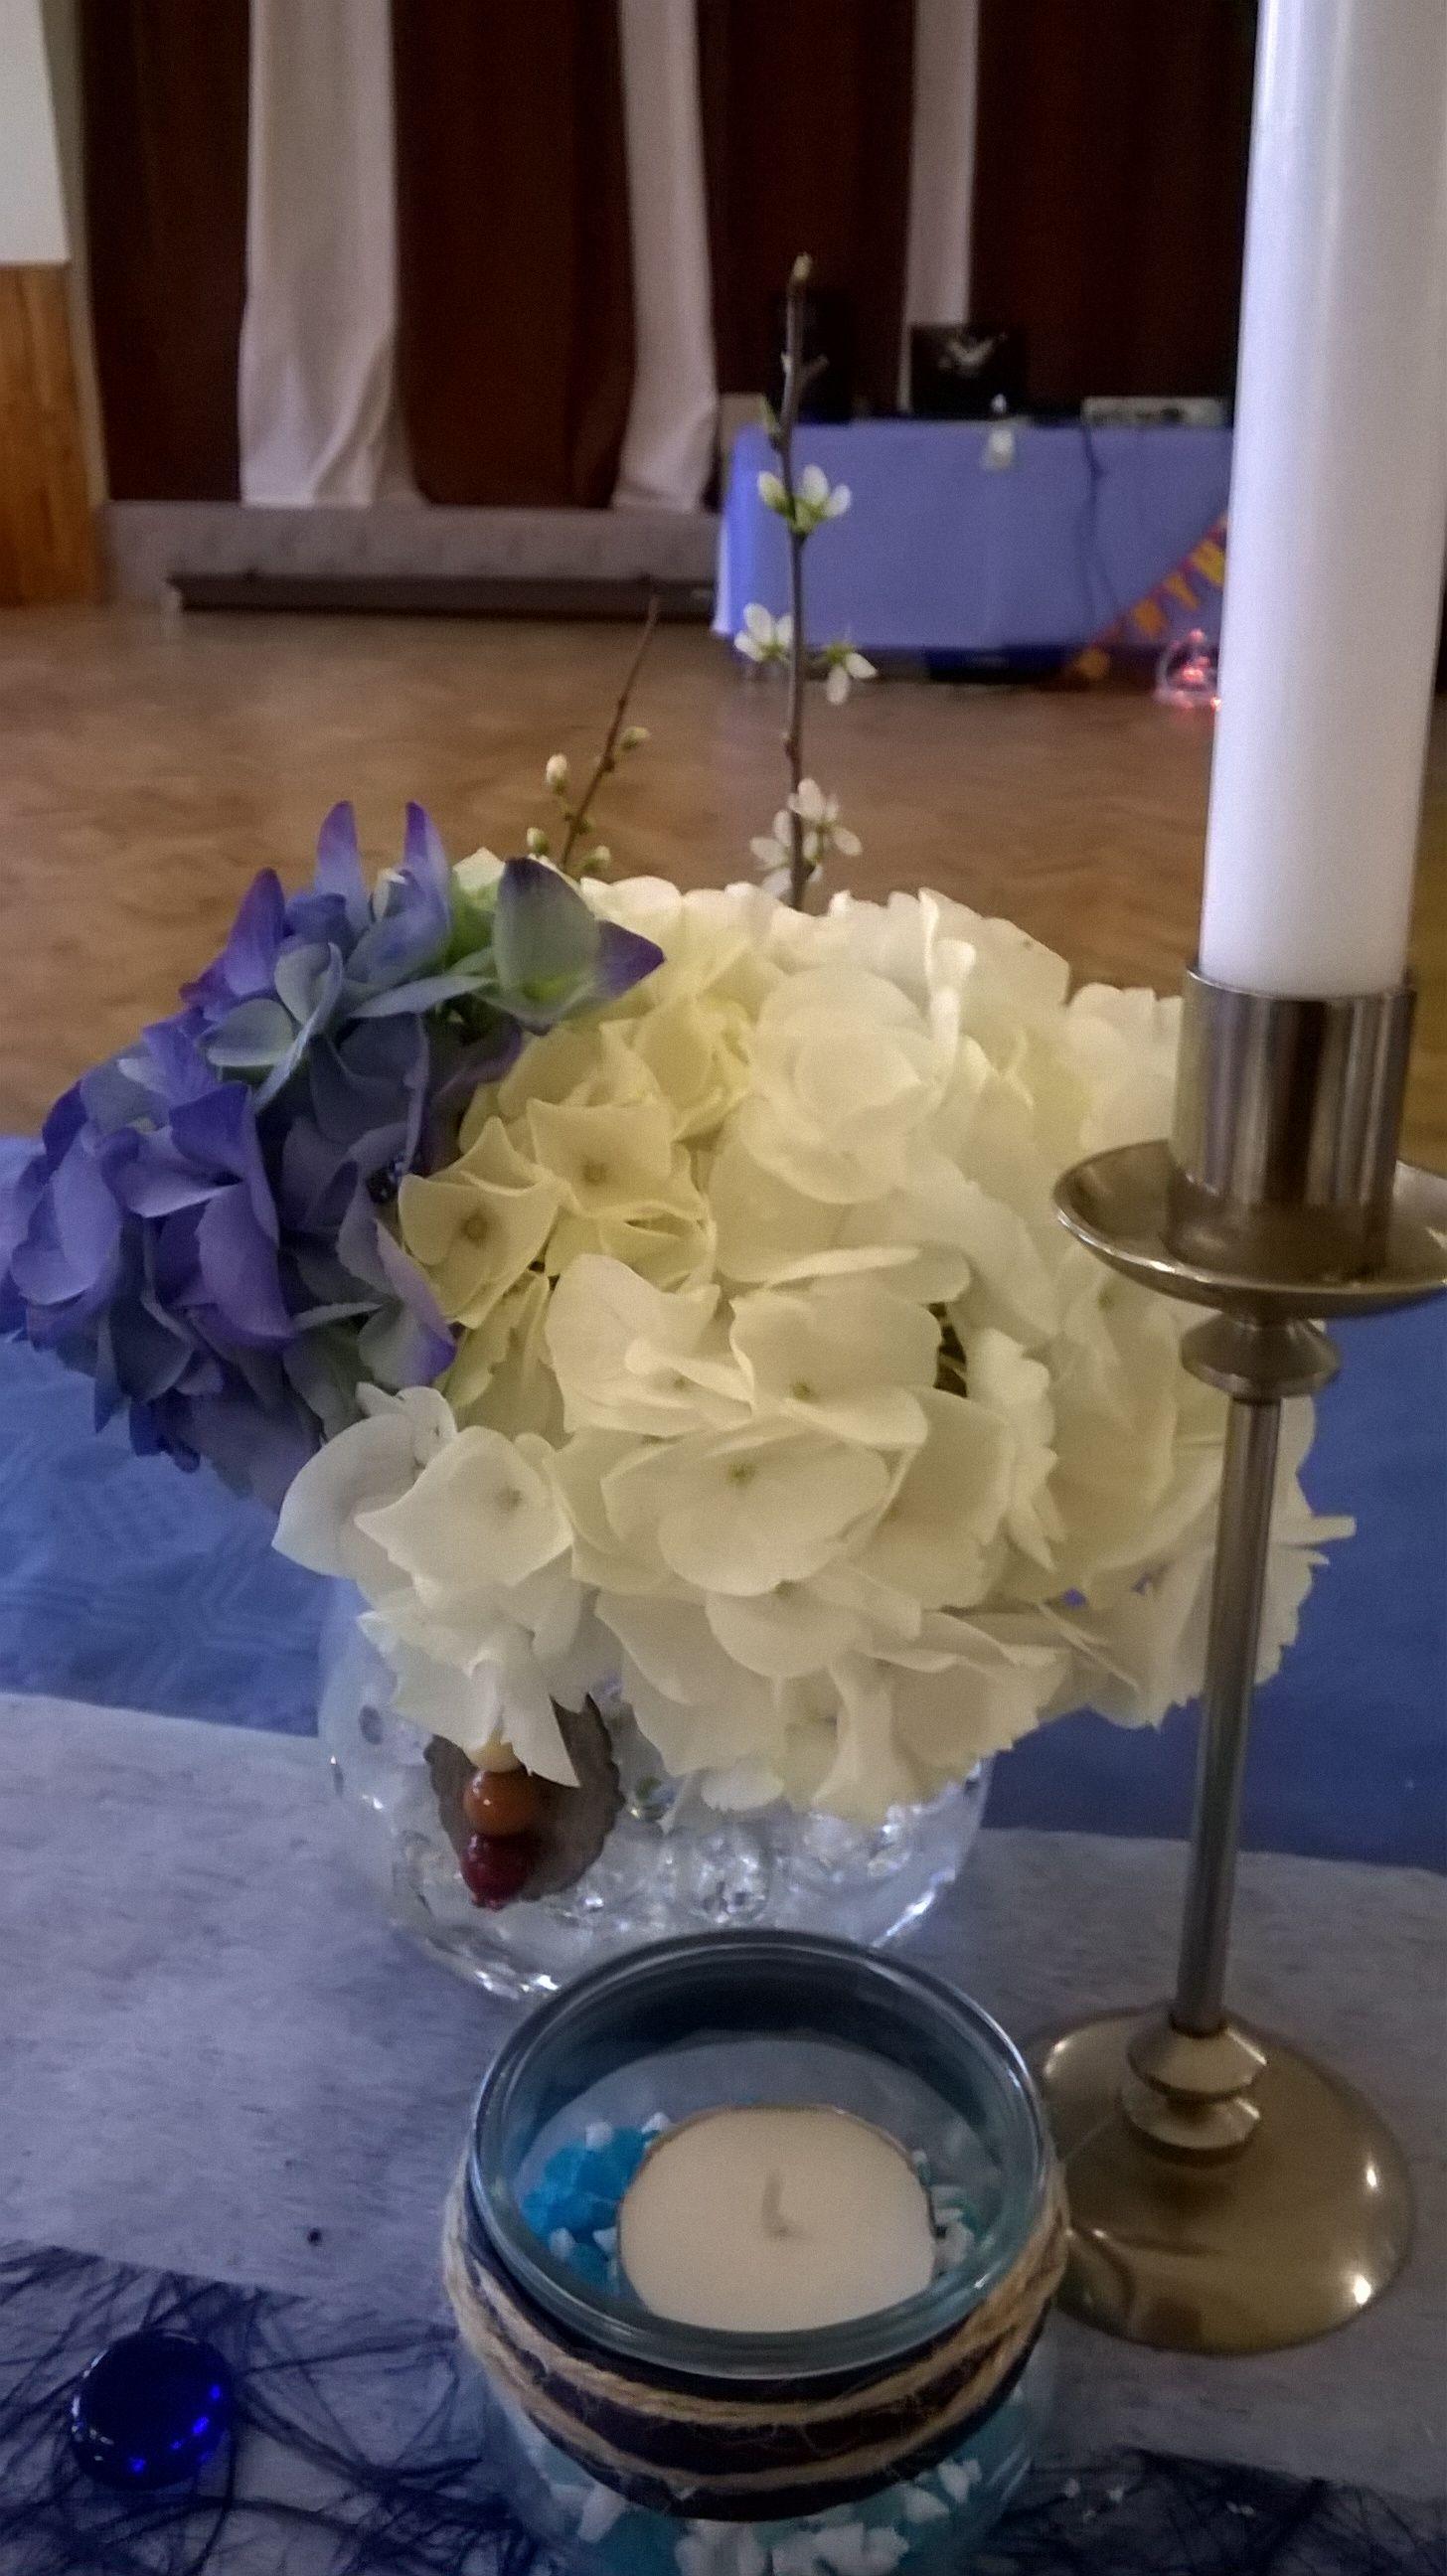 Hortensie blau weiß Aquaperlen Kerzen